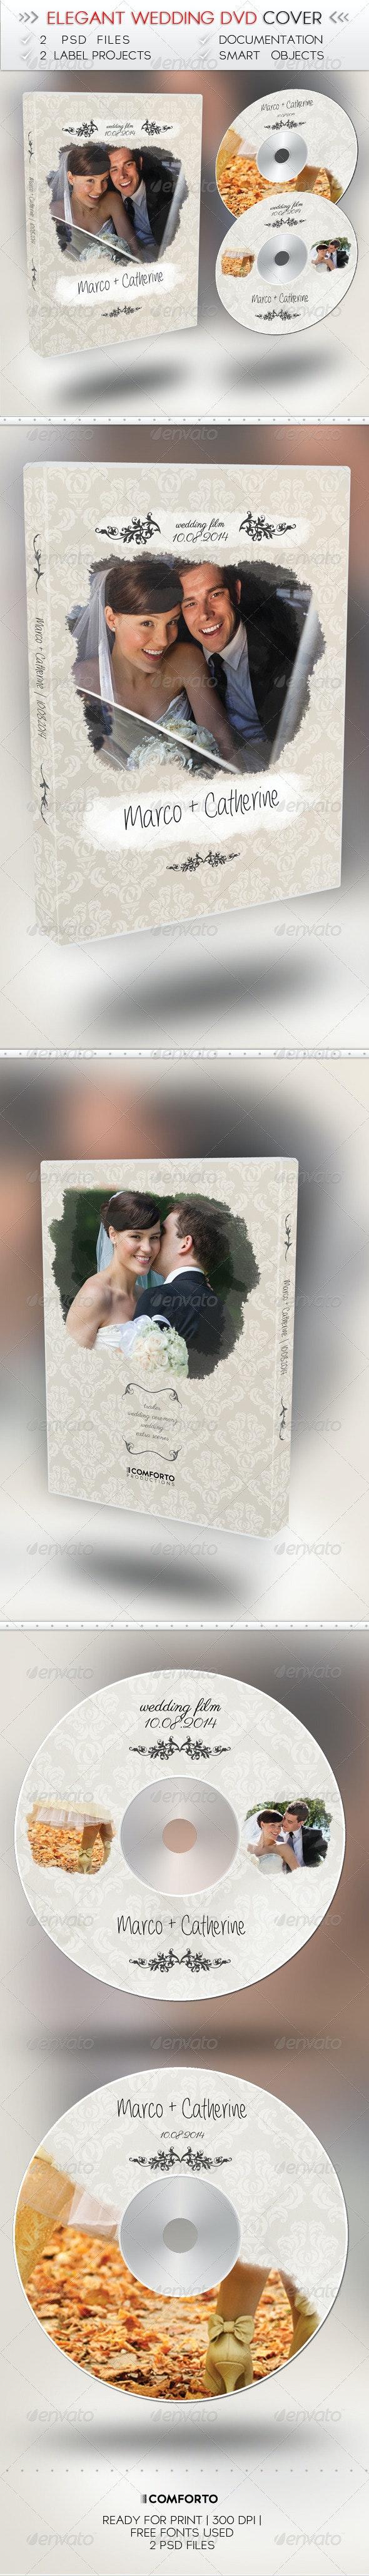 Elegant Wedding DVD Cover - CD & DVD Artwork Print Templates